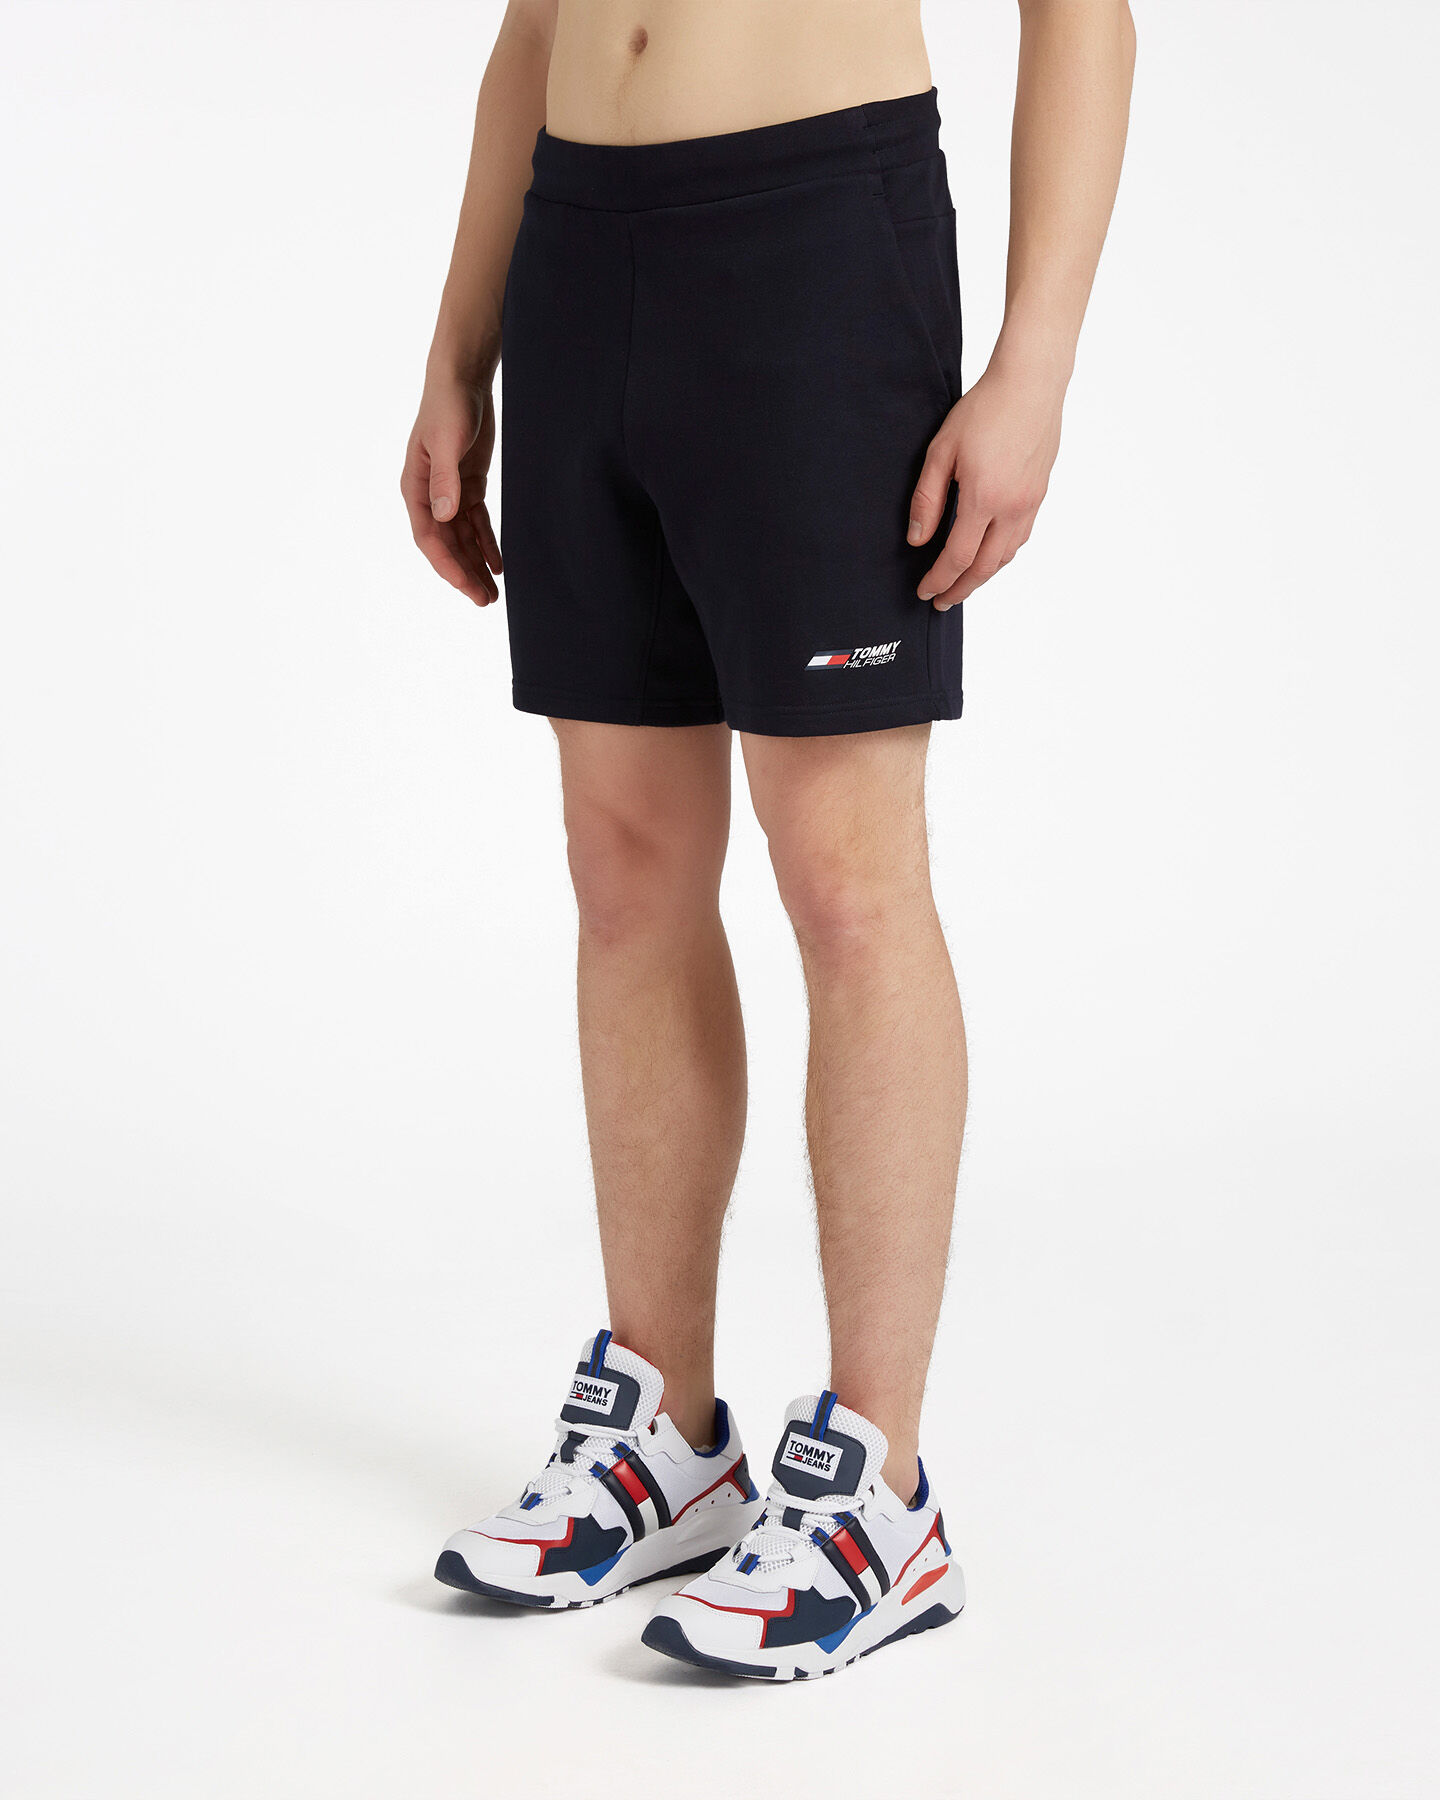 Pantaloncini TOMMY HILFIGER SMALL LOGO M S4089497 scatto 2